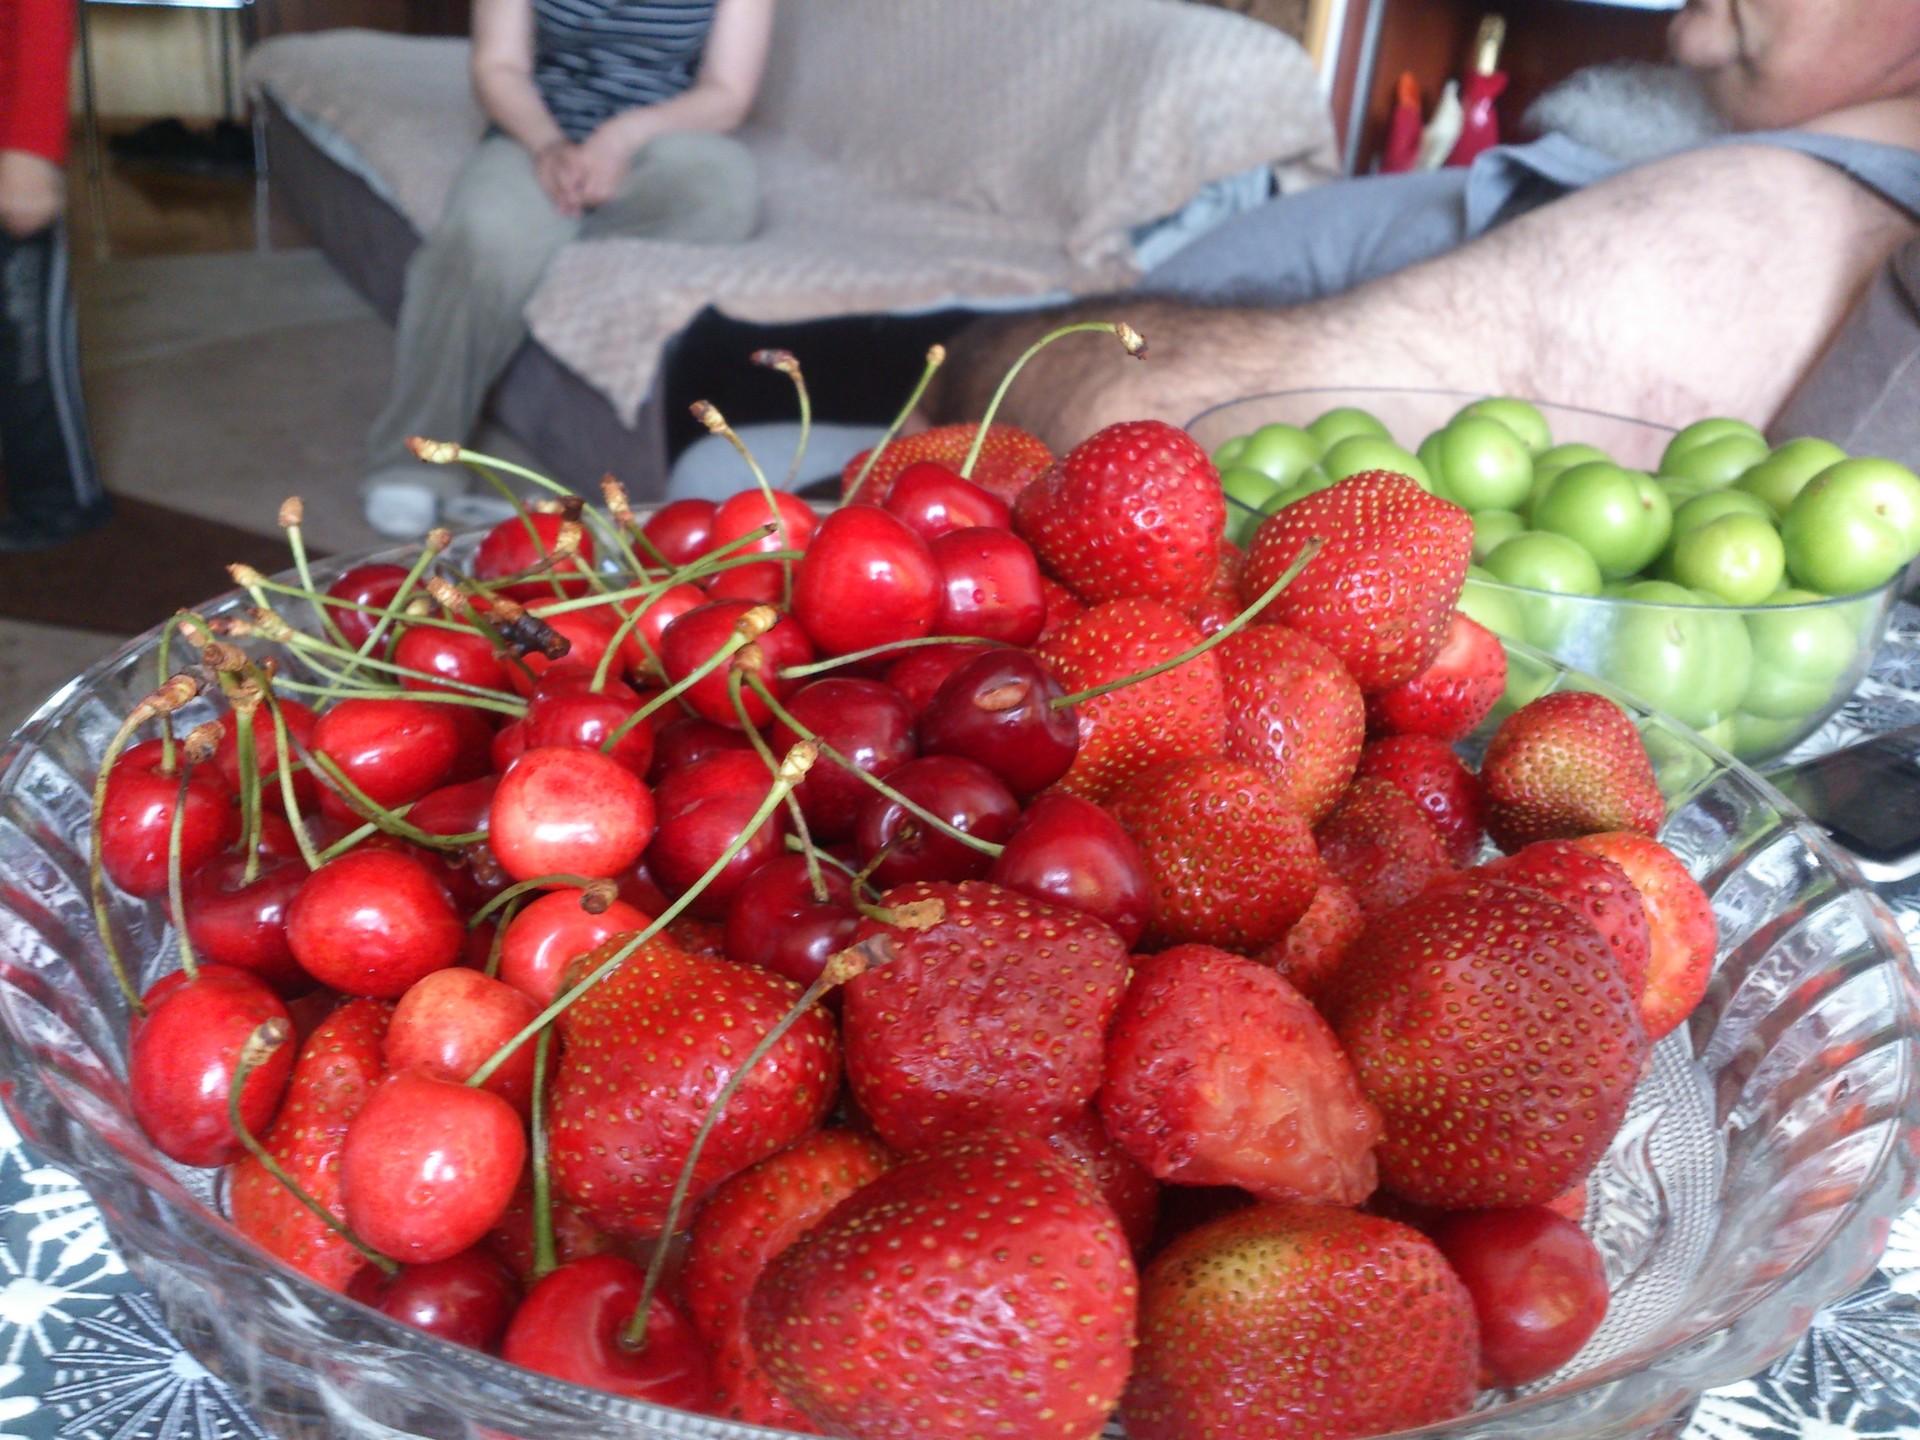 summer-fruit-04f3b23cab31717676d5e6cacad